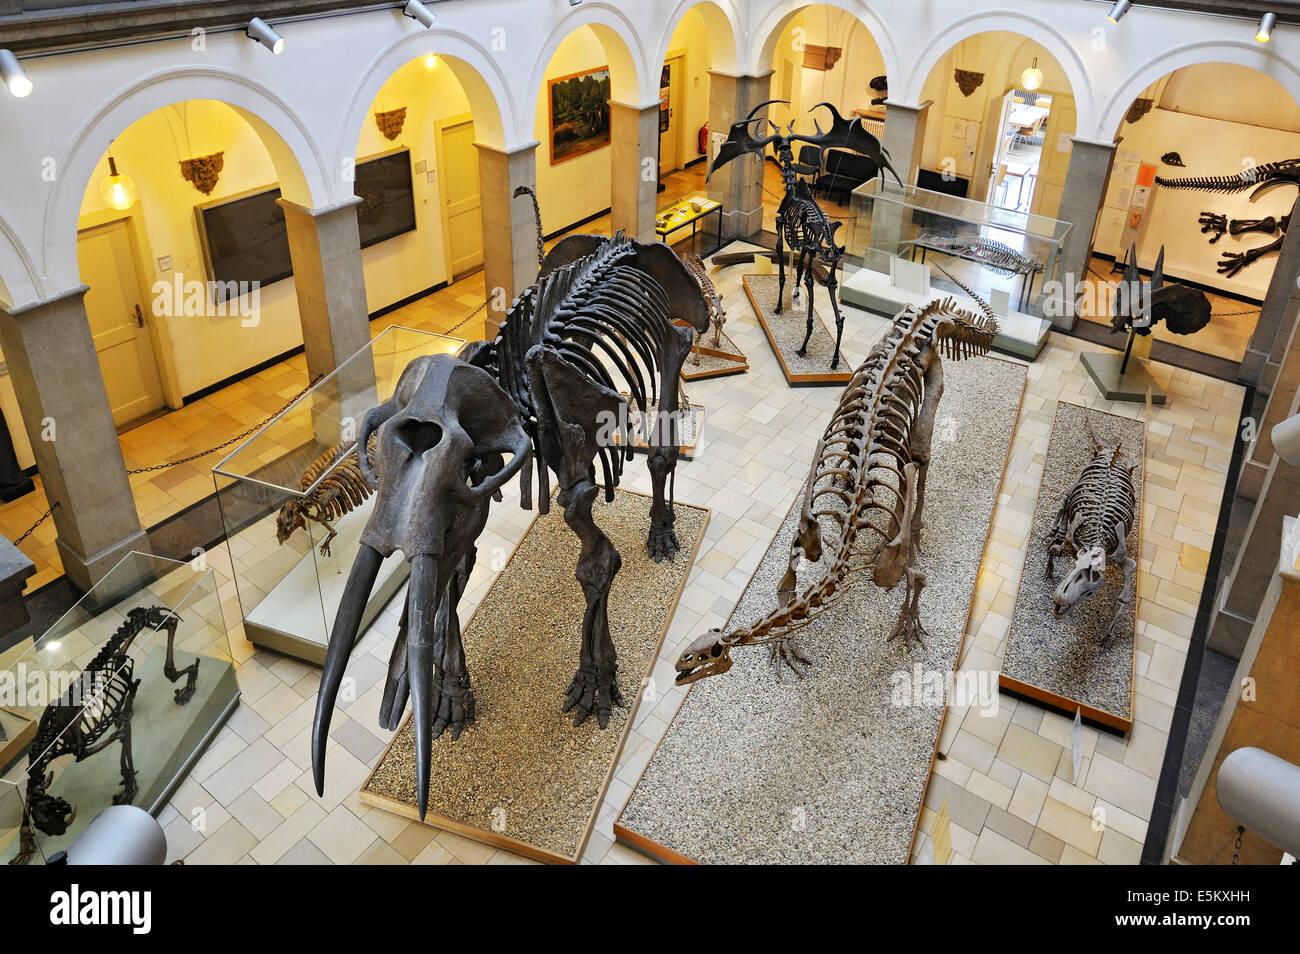 (Gomphotherium Urelefant Mühldorfer), esqueleto, museo Paleontológico, Munich, Baviera, Alemania Imagen De Stock